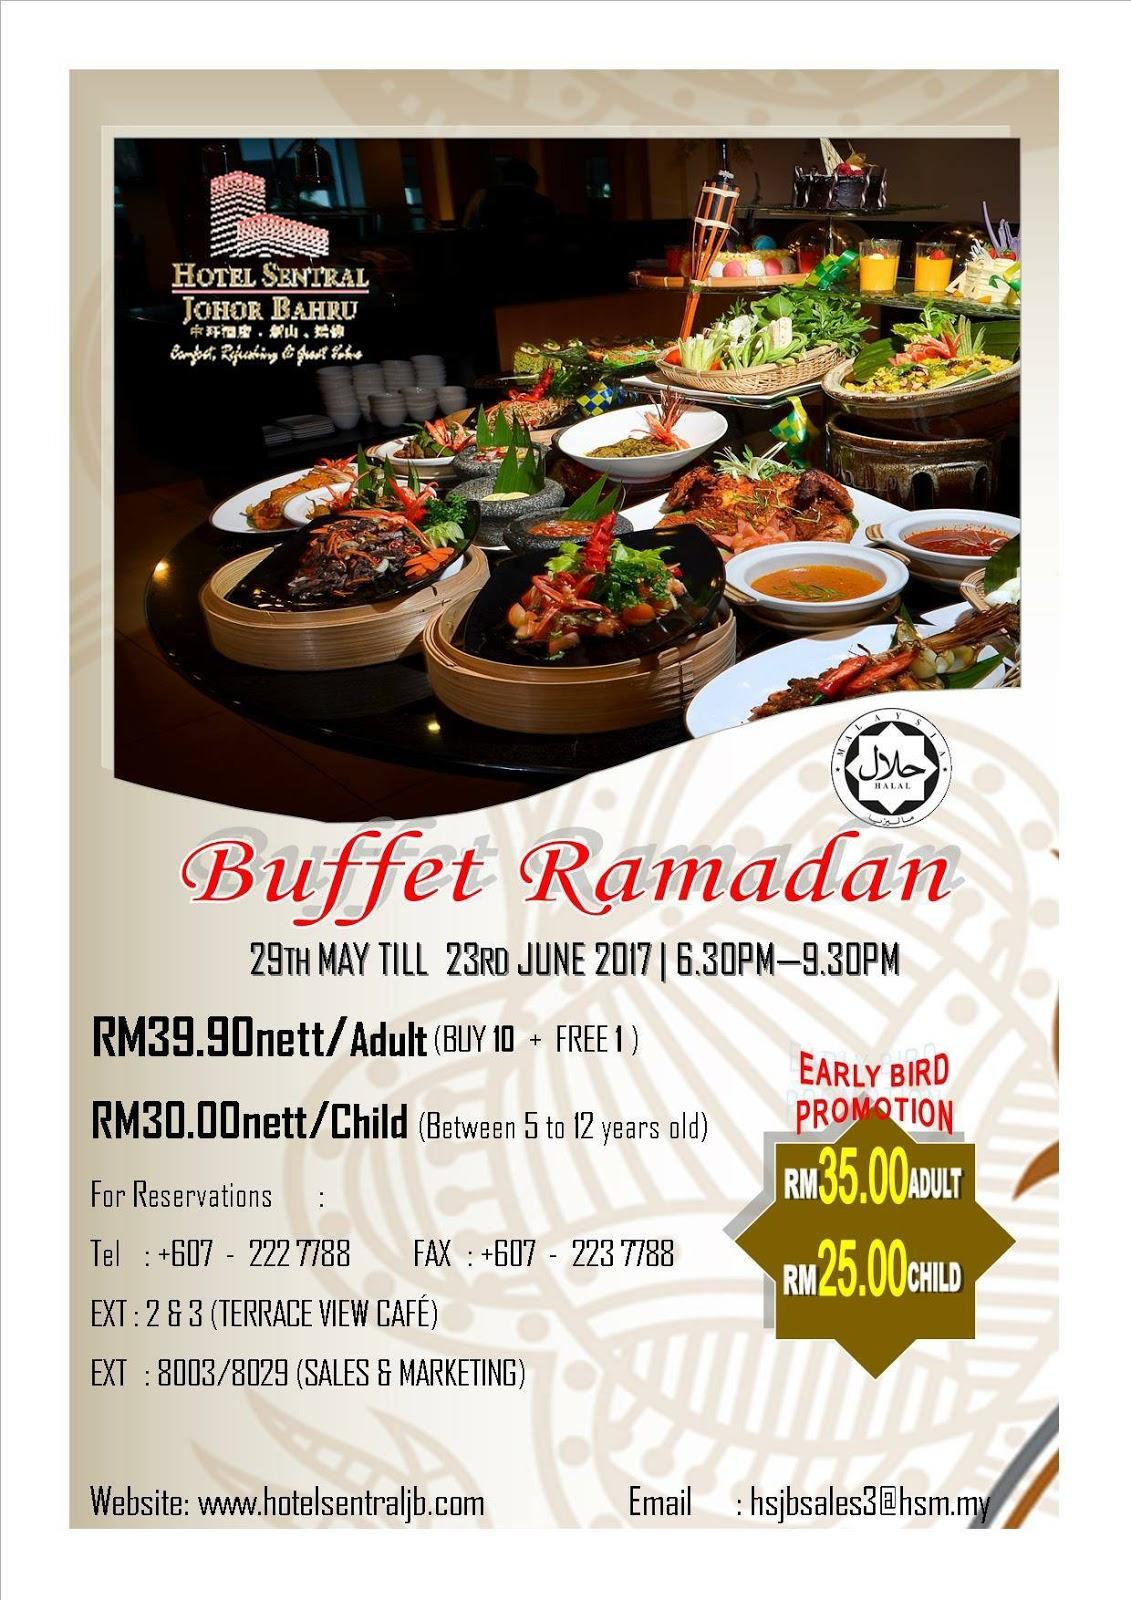 hotel sentral jb buffet ramadhan